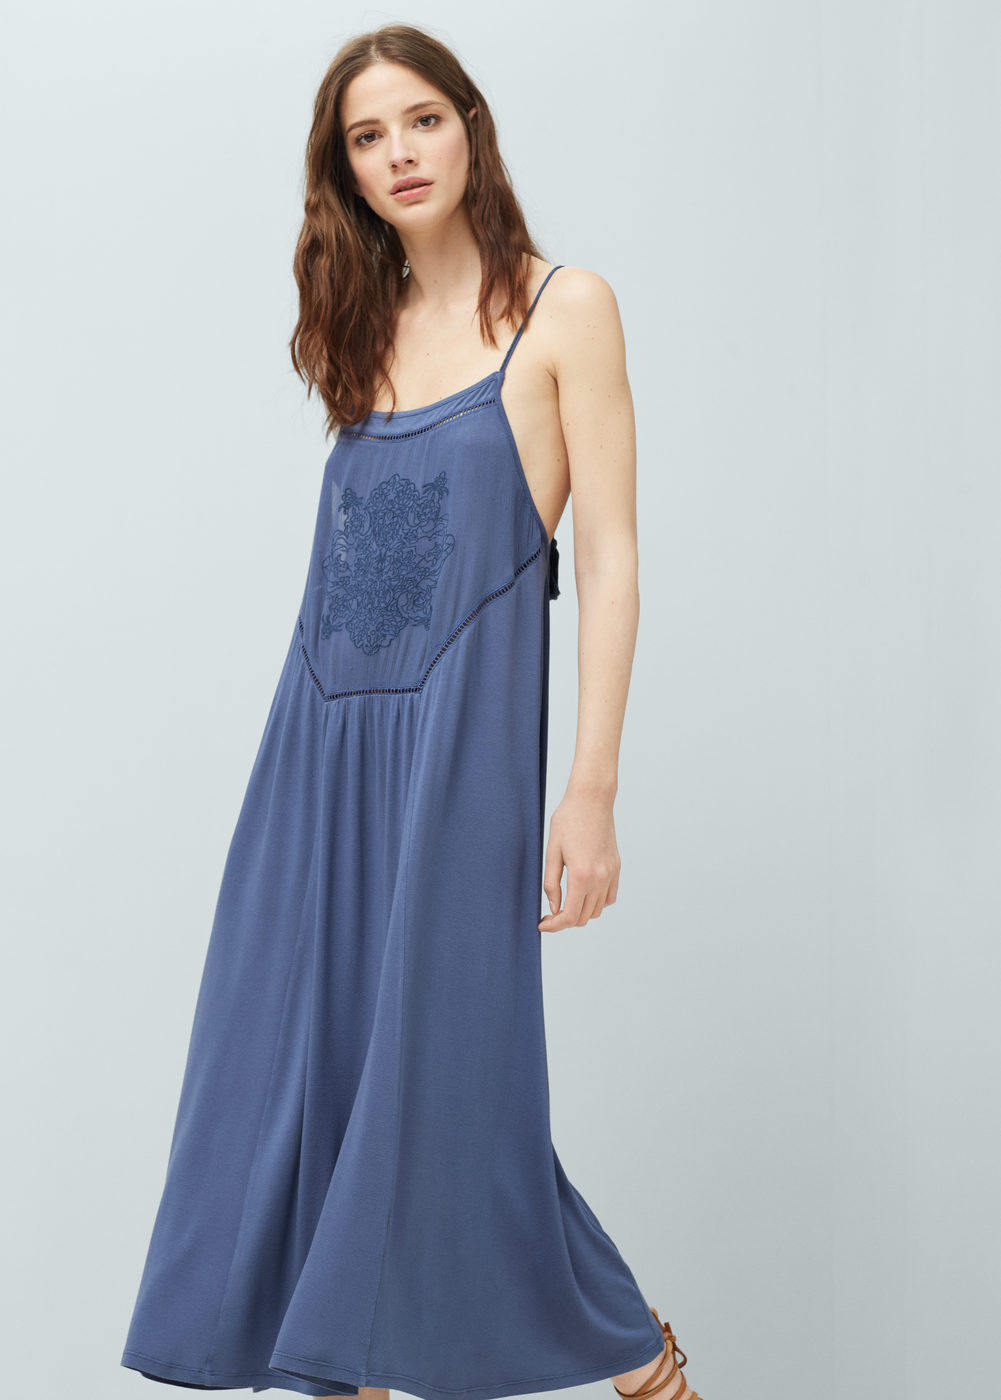 is it safe to talk summer dresses yet? | MyFashionable40s | Bloglovin\'